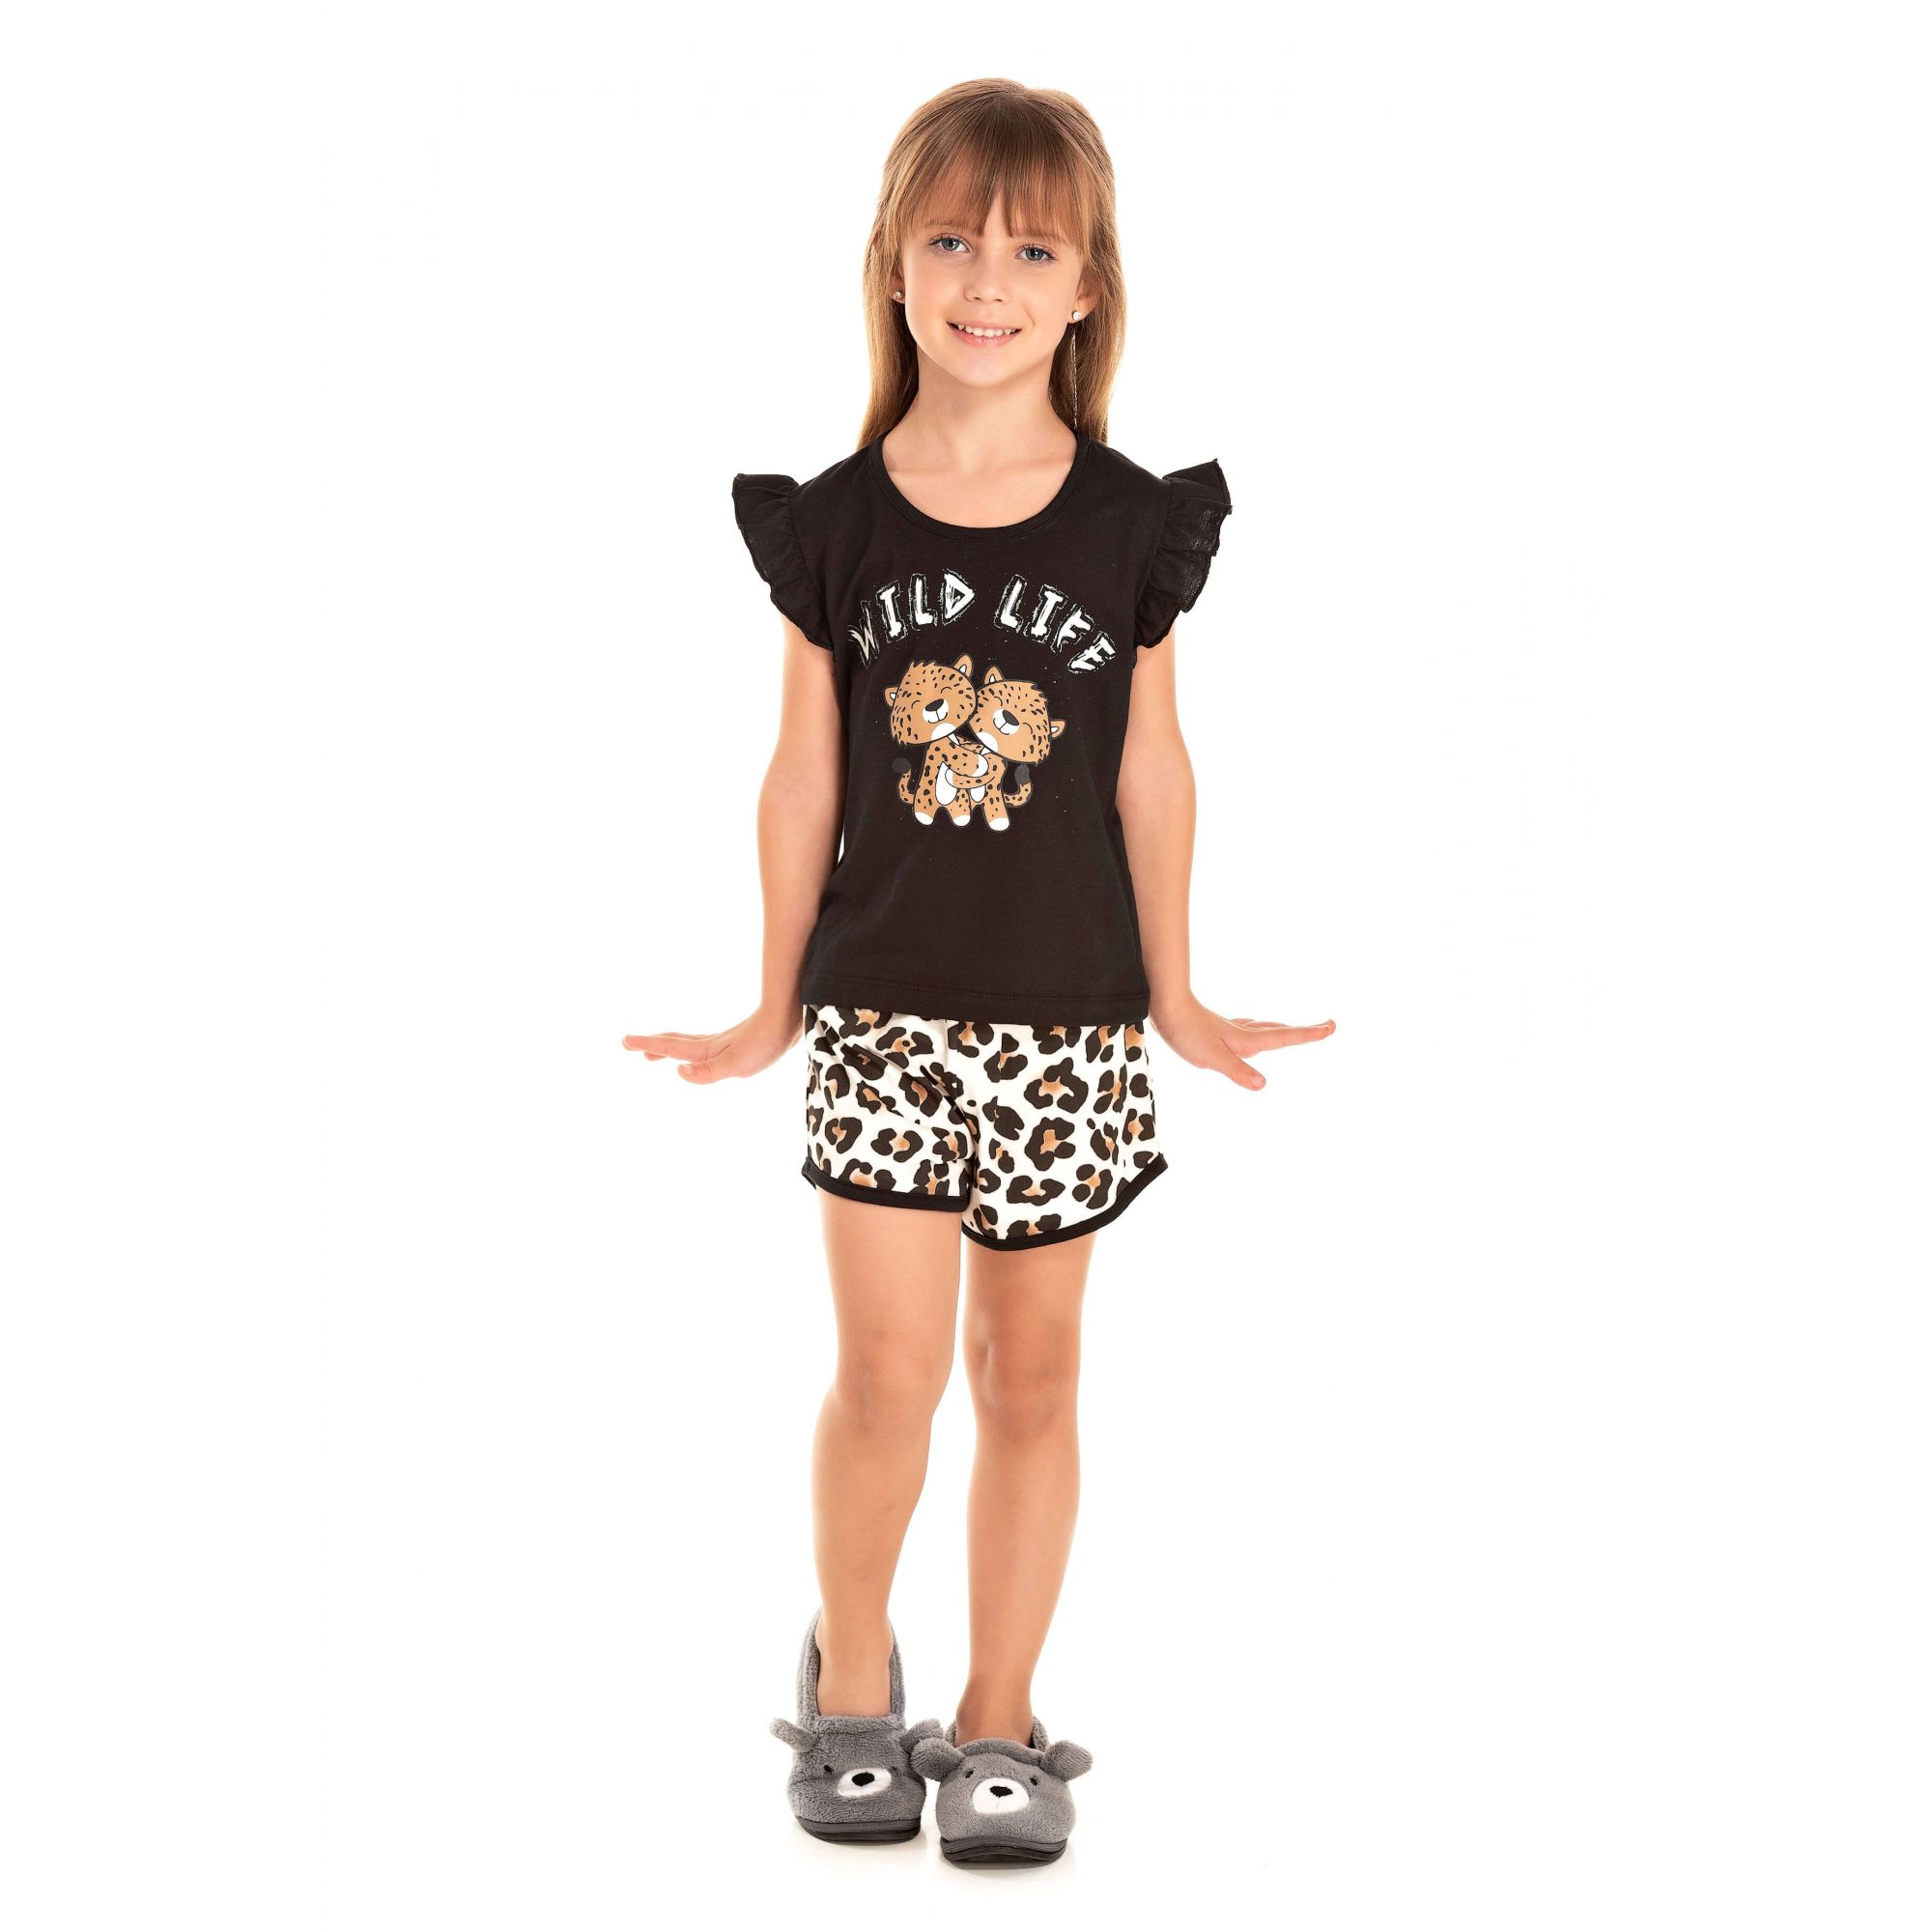 003 - Short Doll  Infantil Feminino Wild Life